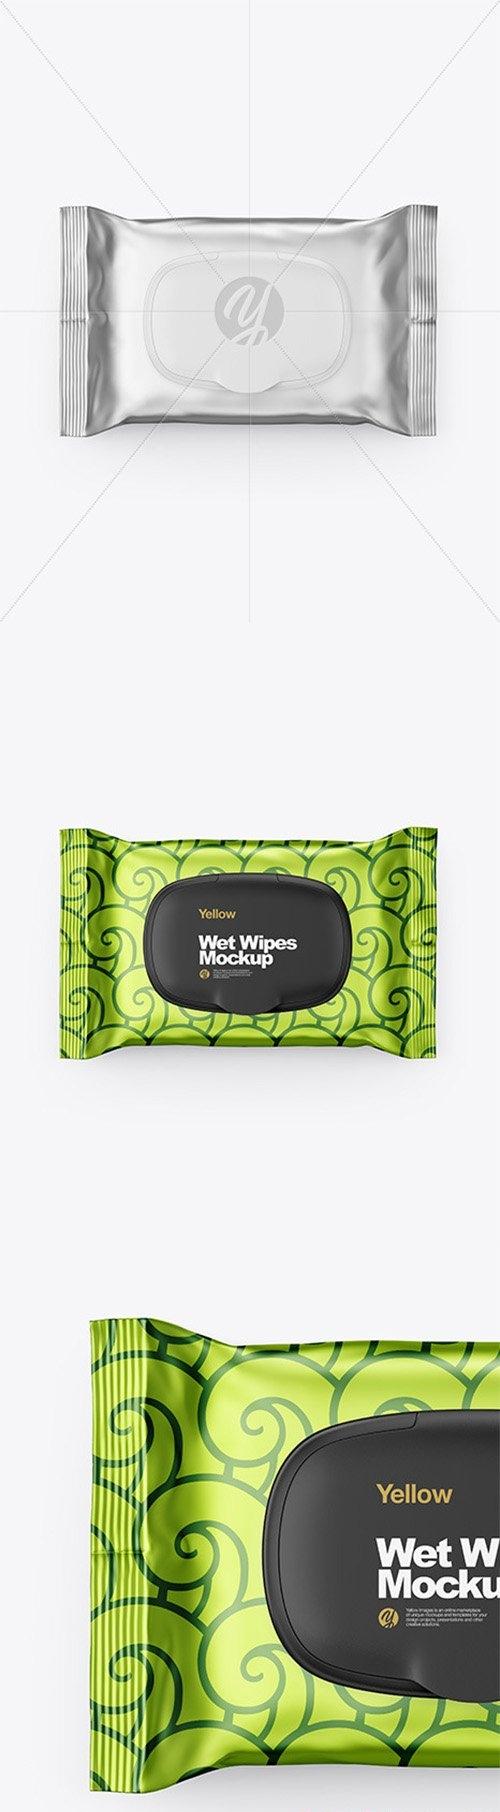 Metallic Wet Wipes Pack With Plastic Cap Mockup - Top View 62237